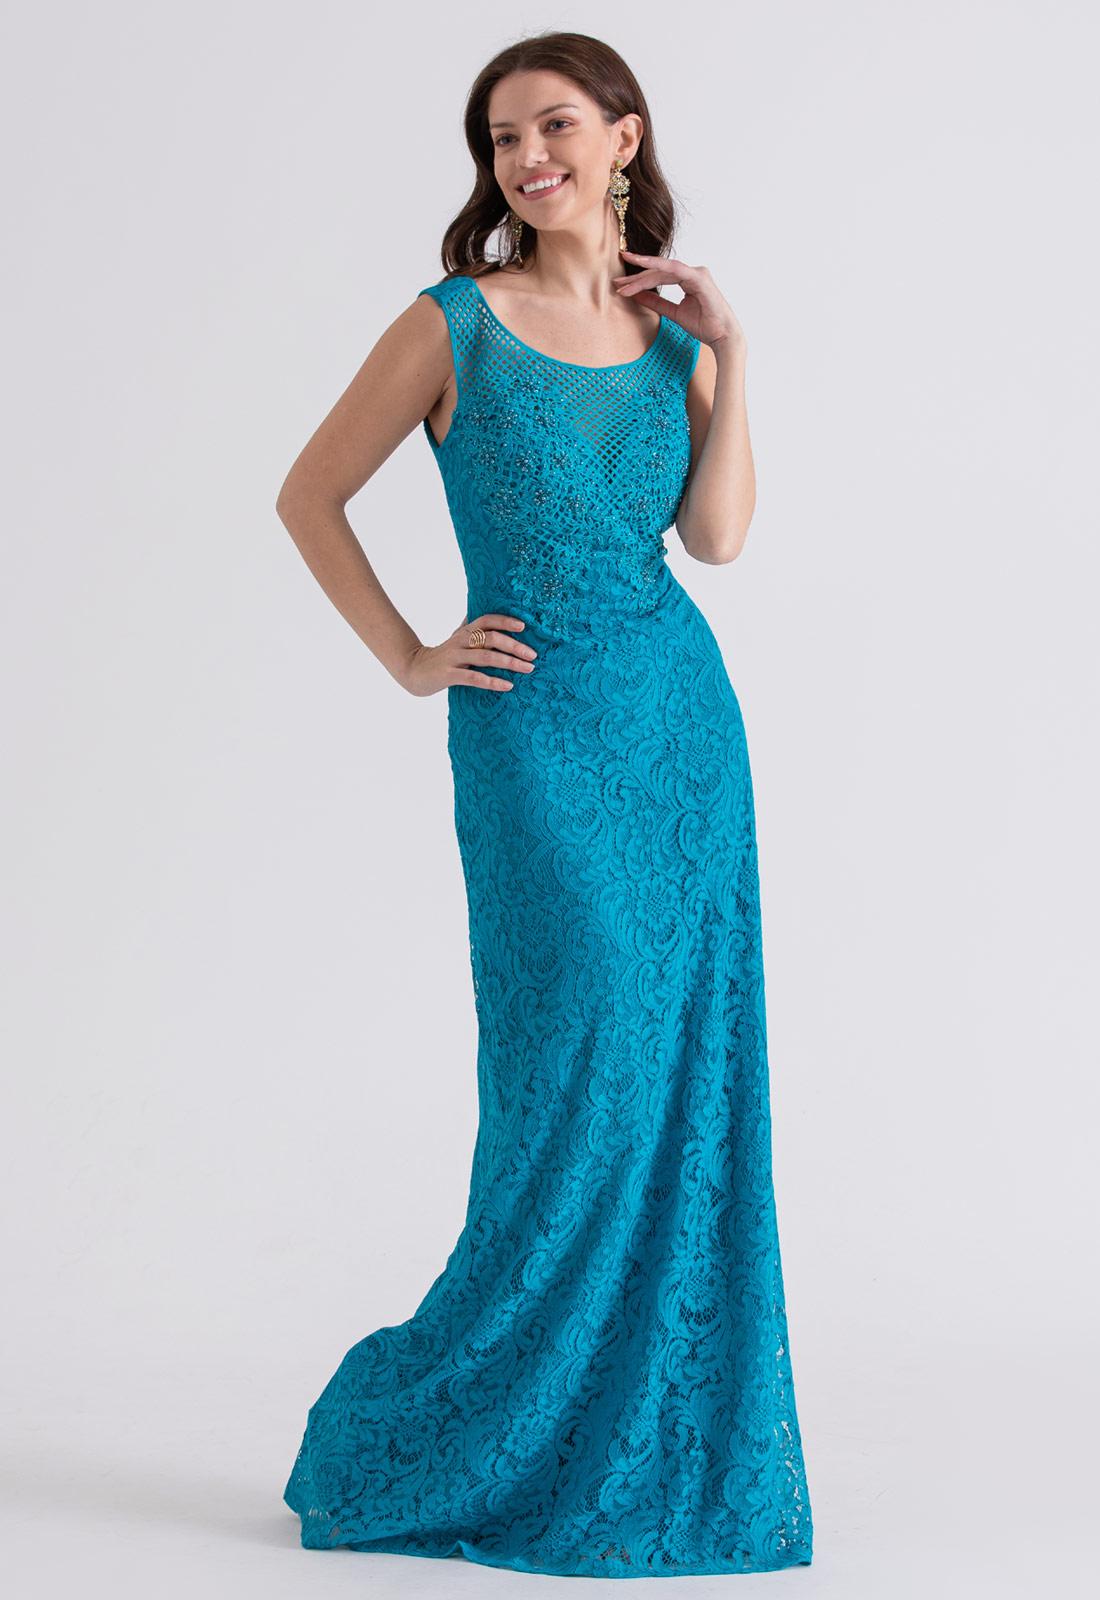 Vestido de festa em Renda azul turquesa - Ref. 2212